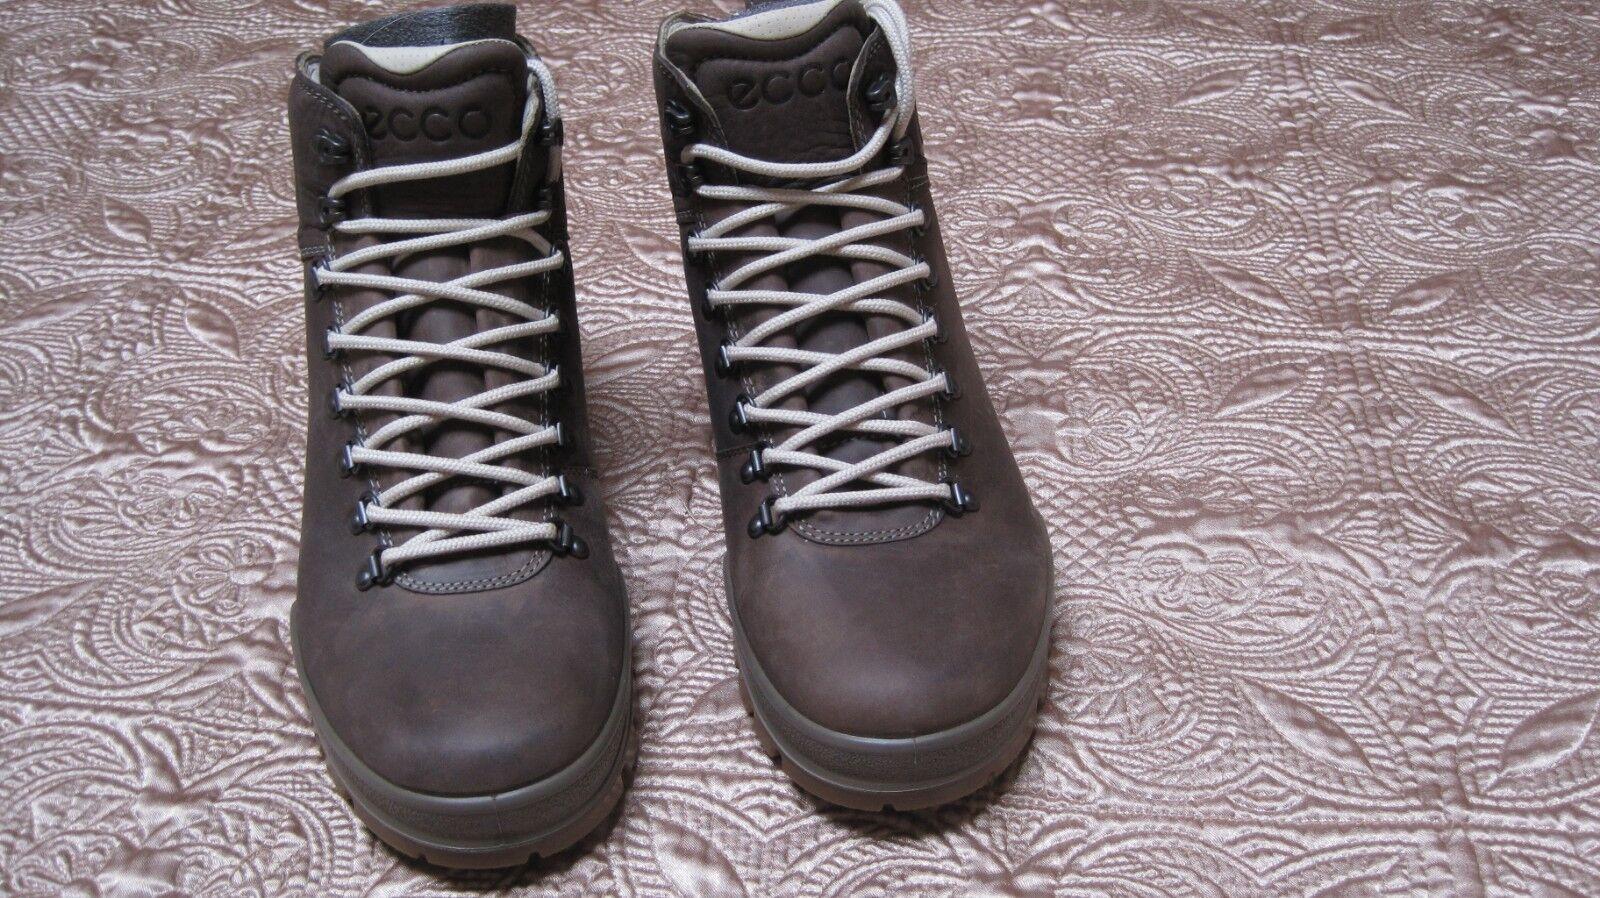 NIB Men's ECCO Track 25 Hydromax Mens Ankle Boots Brown size